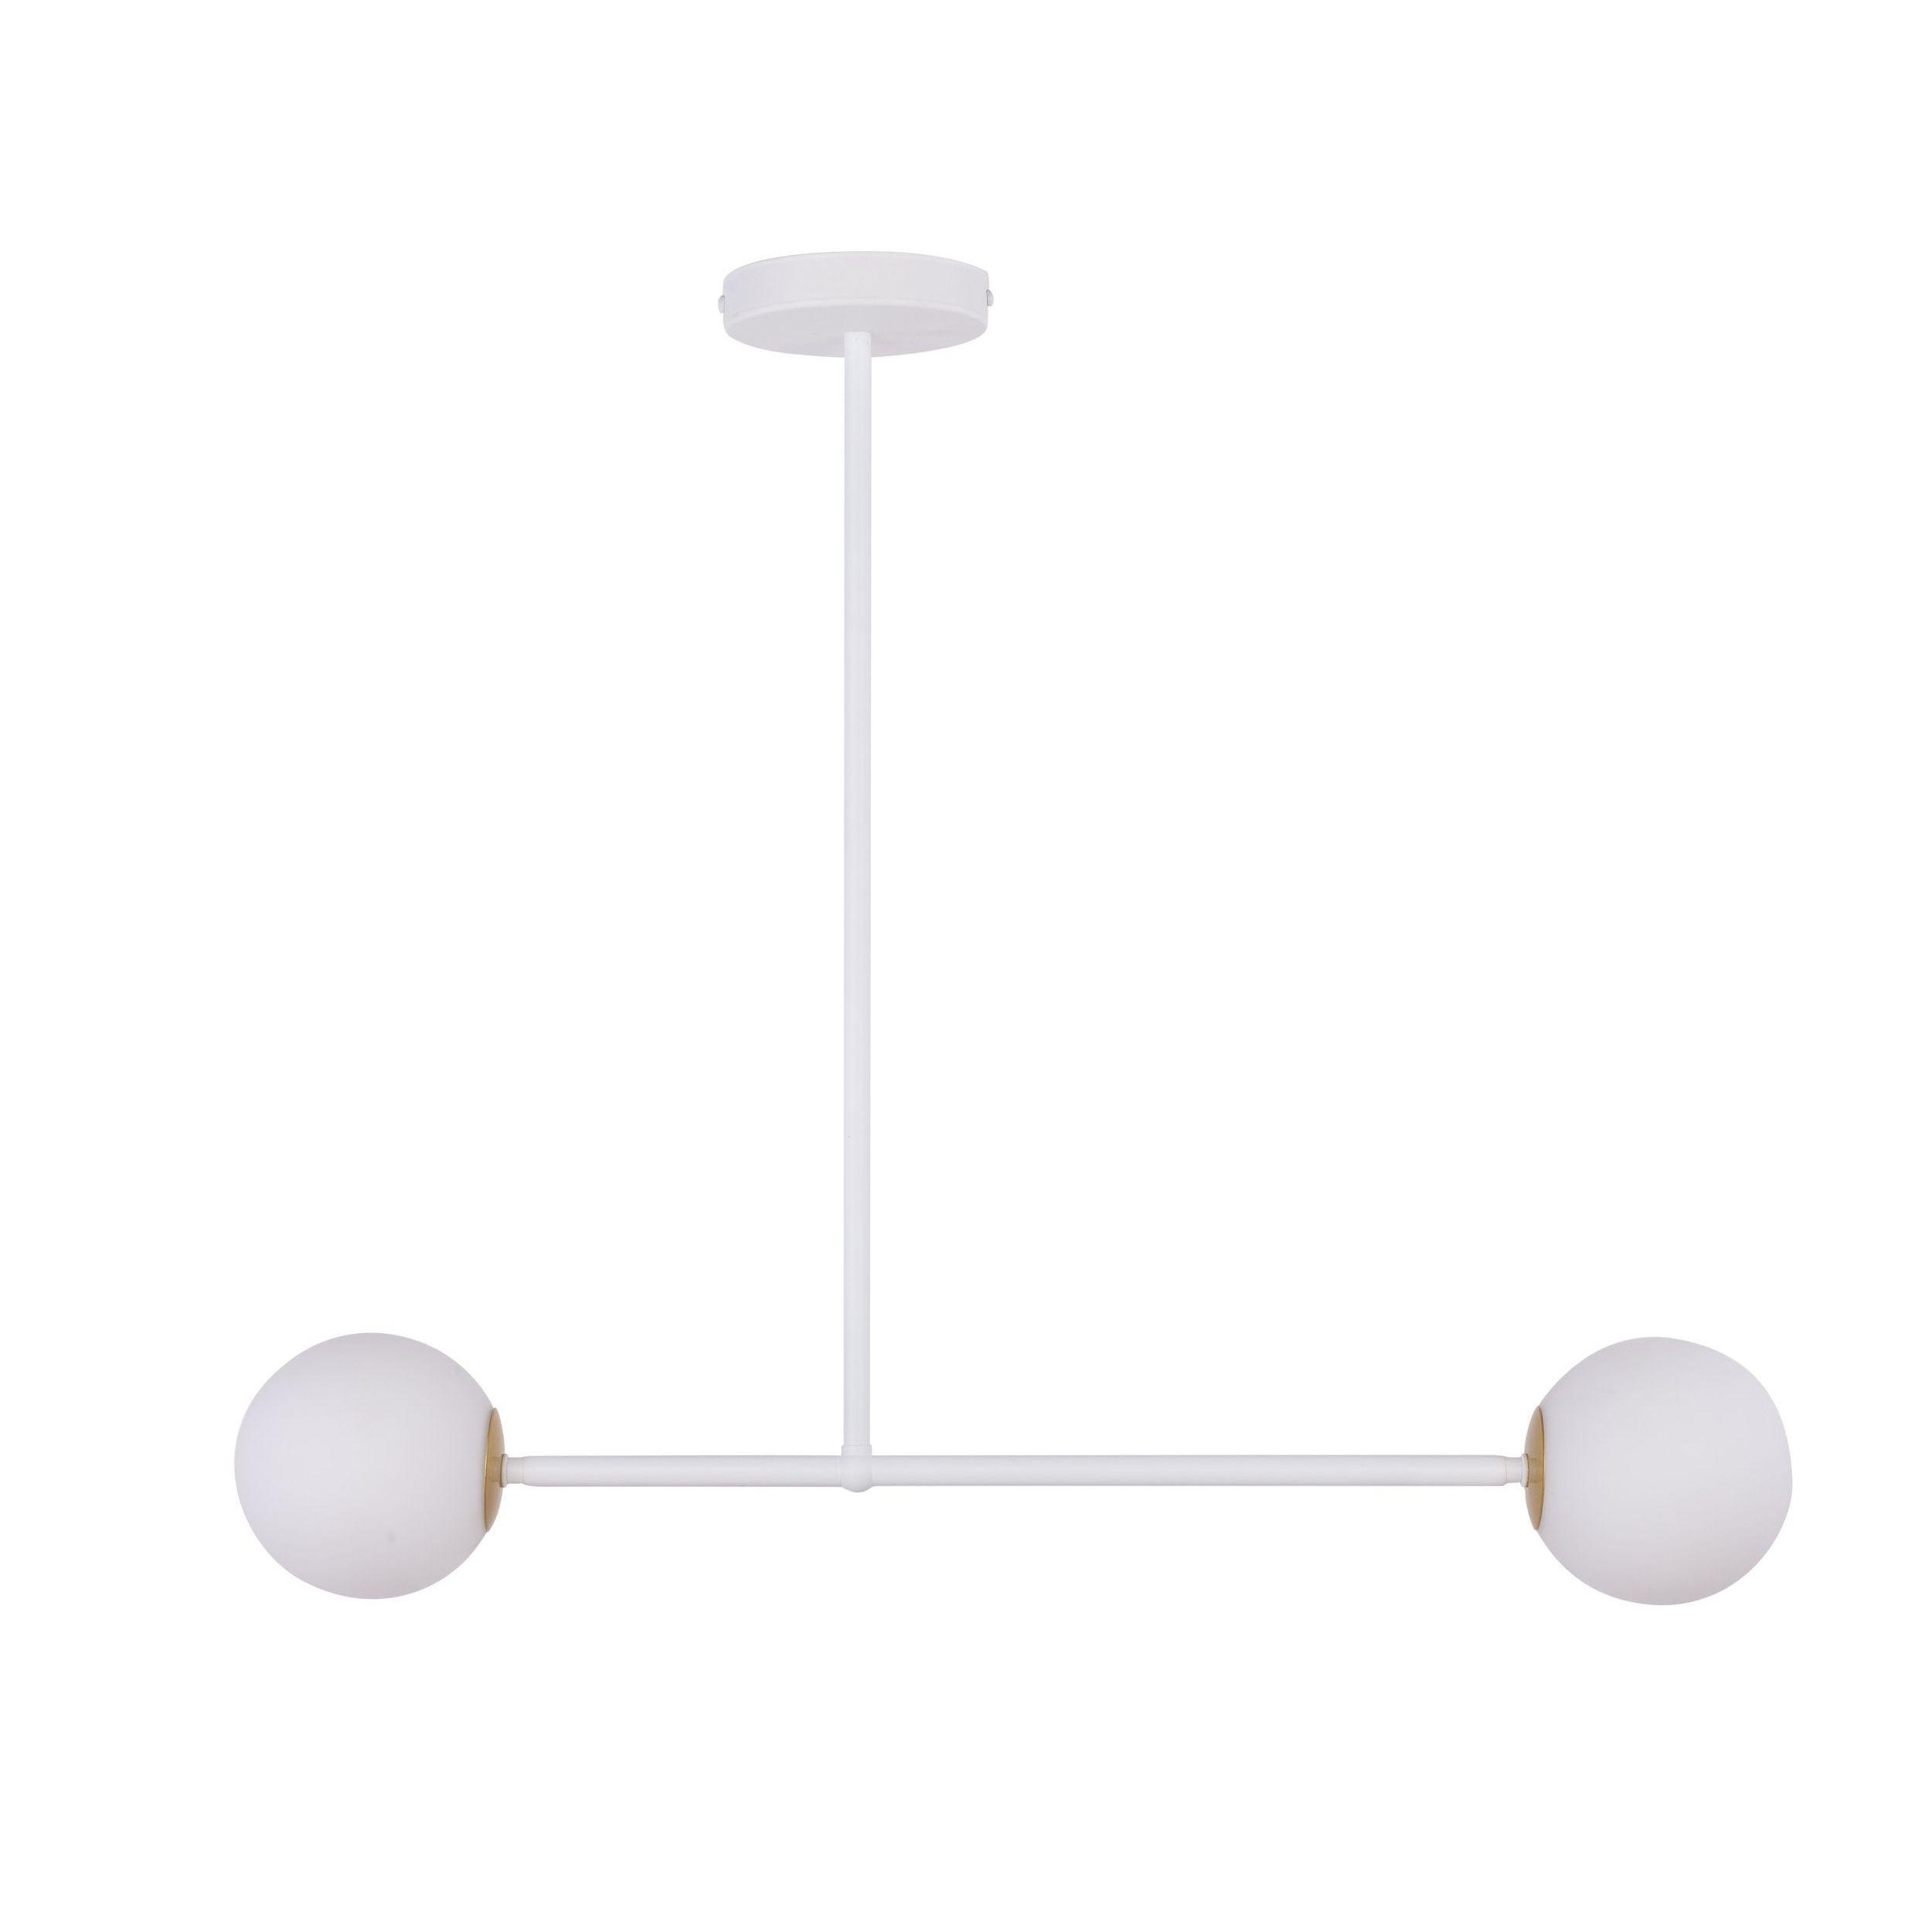 Lampa sufitowa Sigma Gama x2 Biały